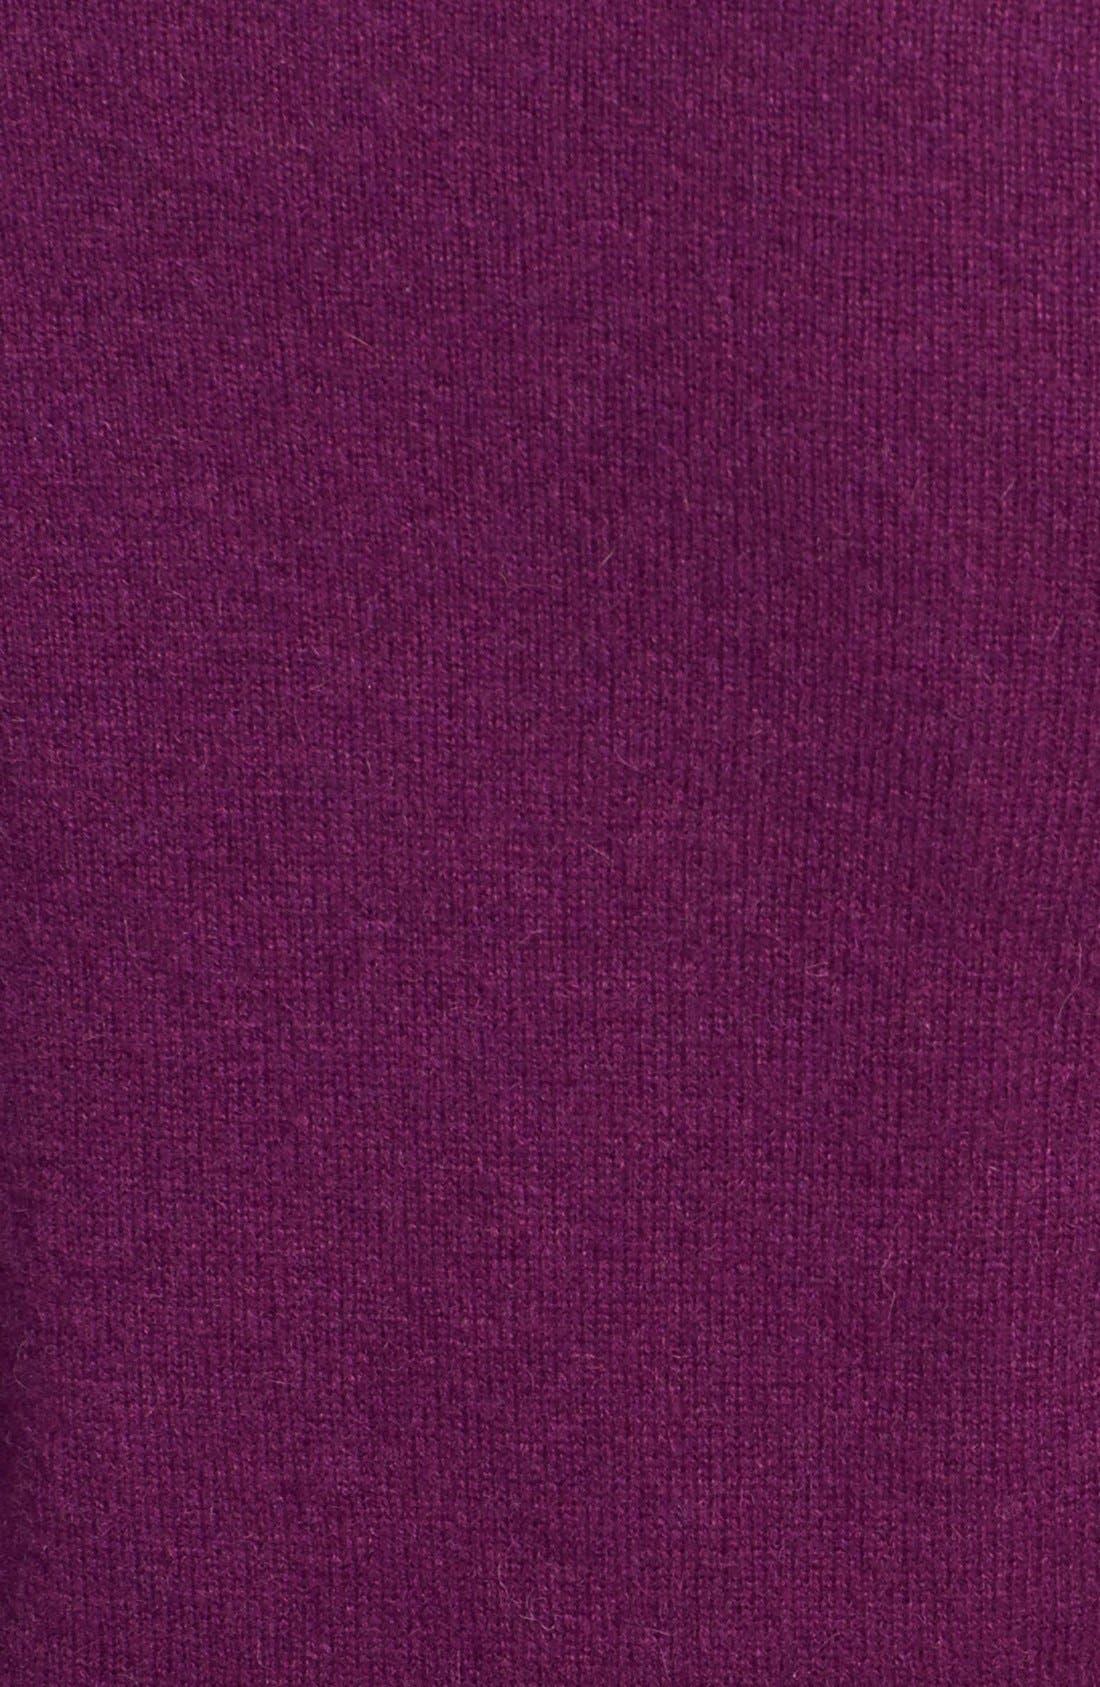 ,                             Cashmere V-Neck Sweater,                             Alternate thumbnail 65, color,                             501